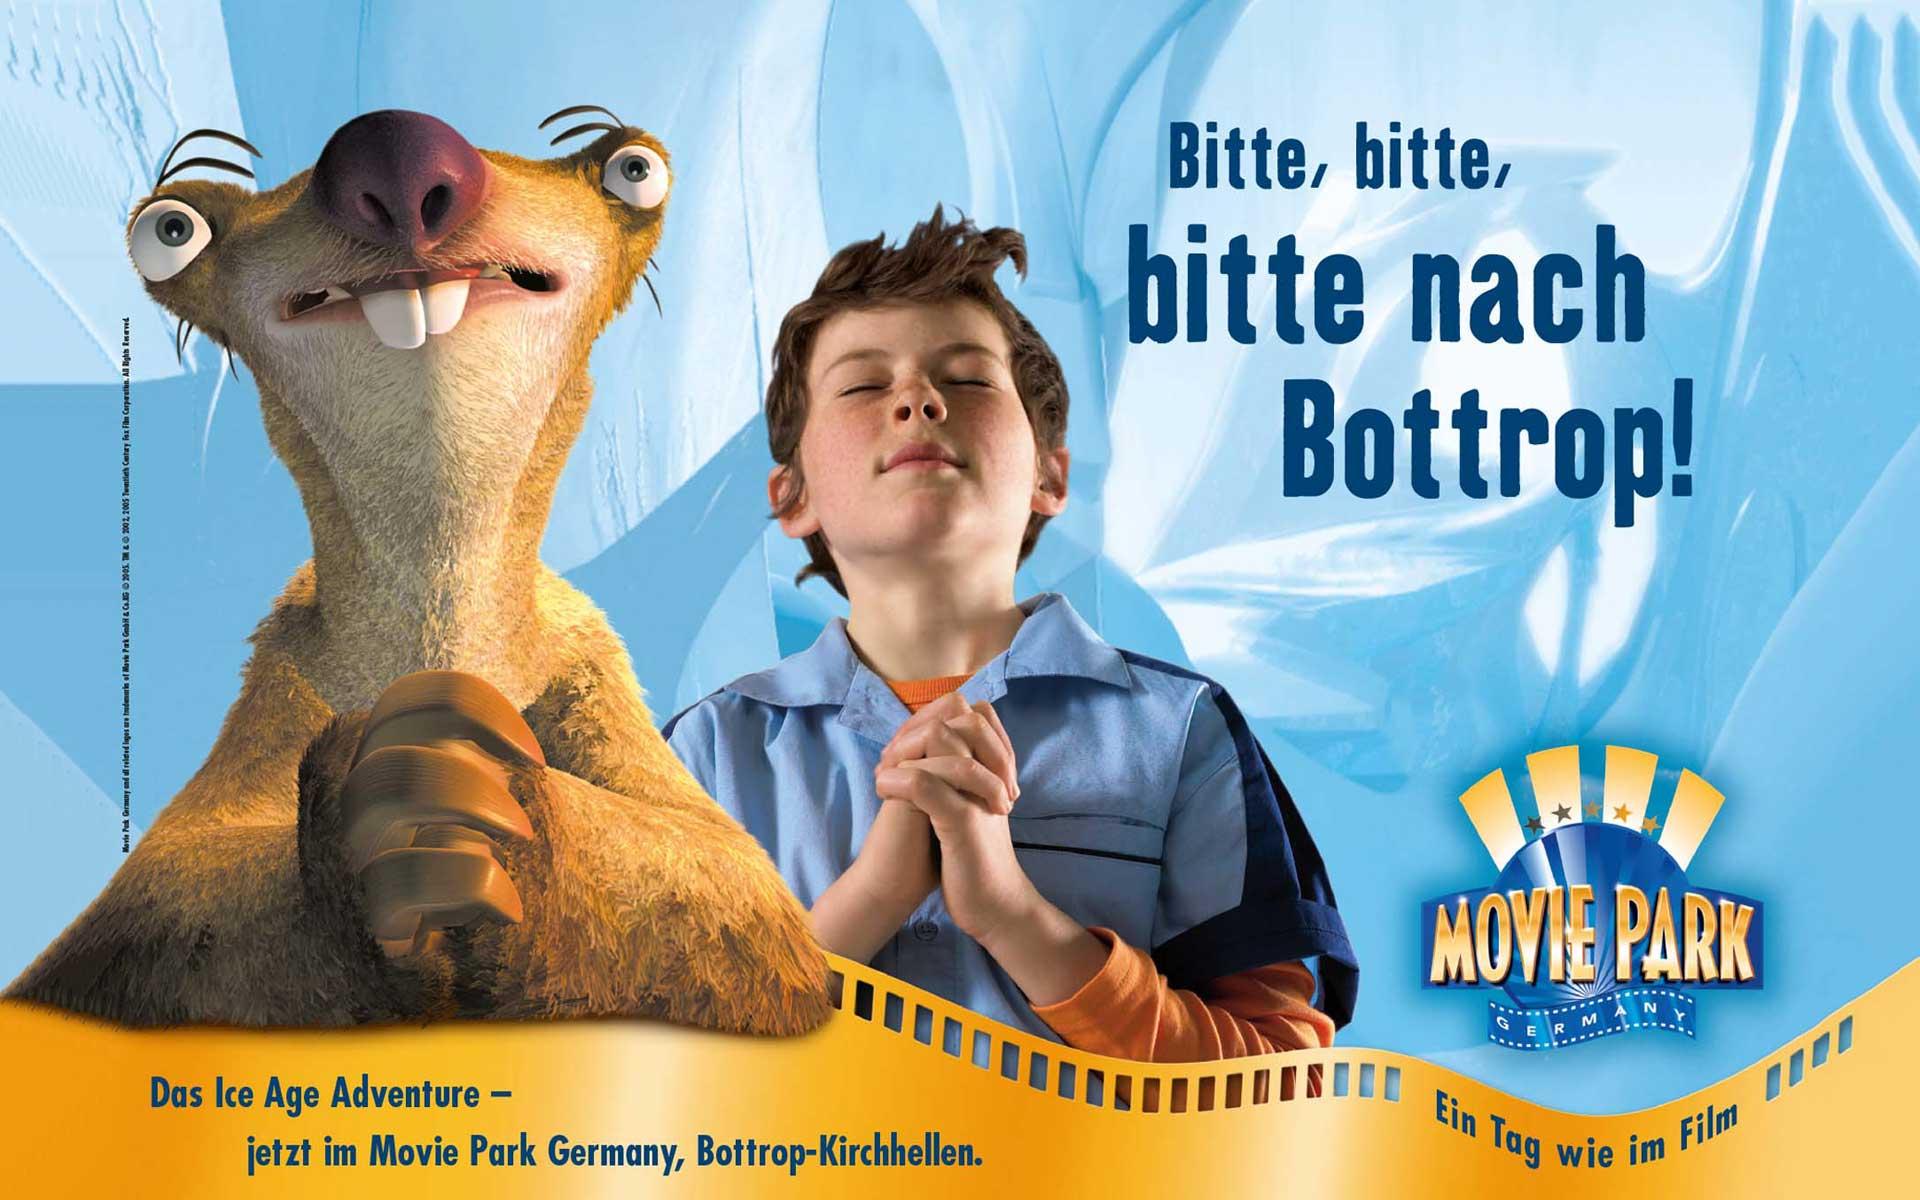 Aussenwerbung Konzept; Motiv Ice Age; Movie Park Germany